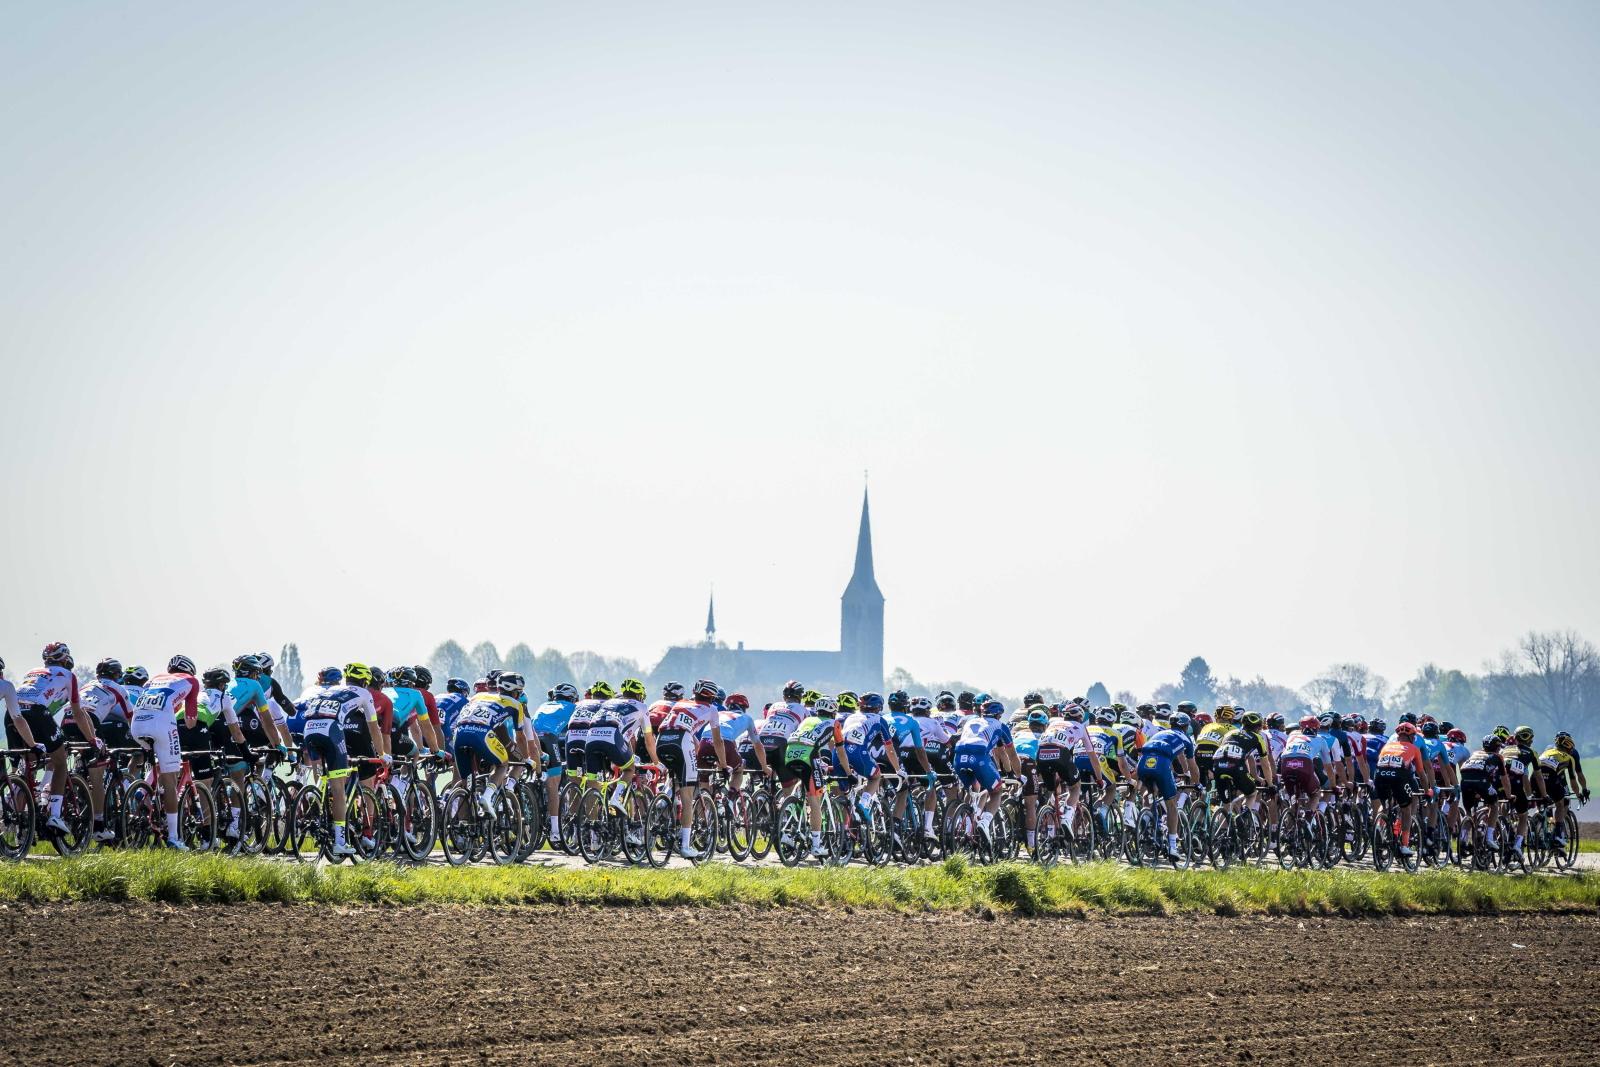 Amstel Gold Race, Holandia. Fot. PAP/EPA/MARCEL VAN HOORN